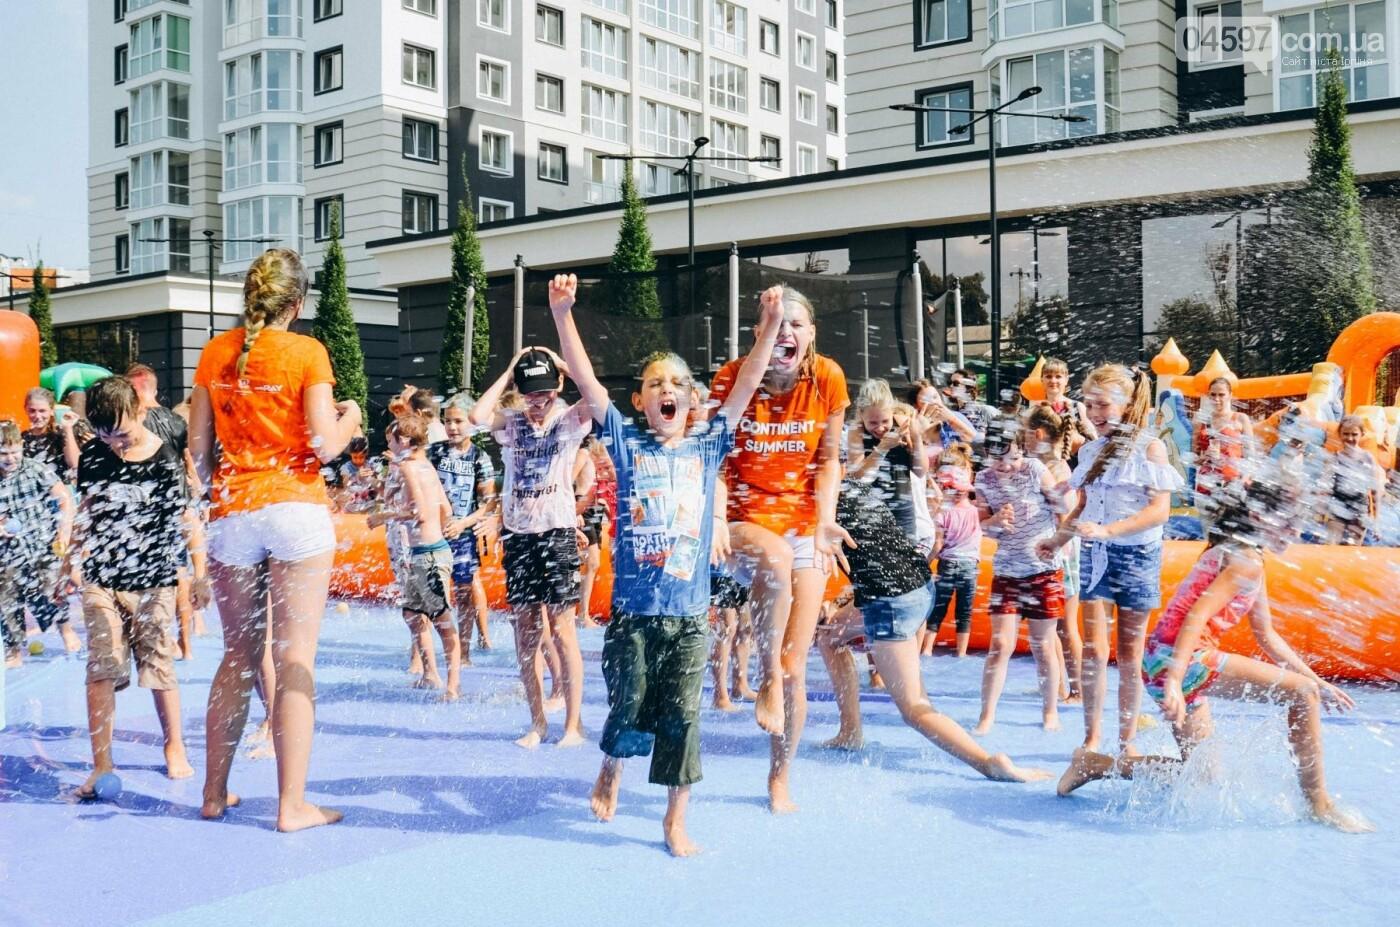 Summer party від Сontinent: як це було, фото-10